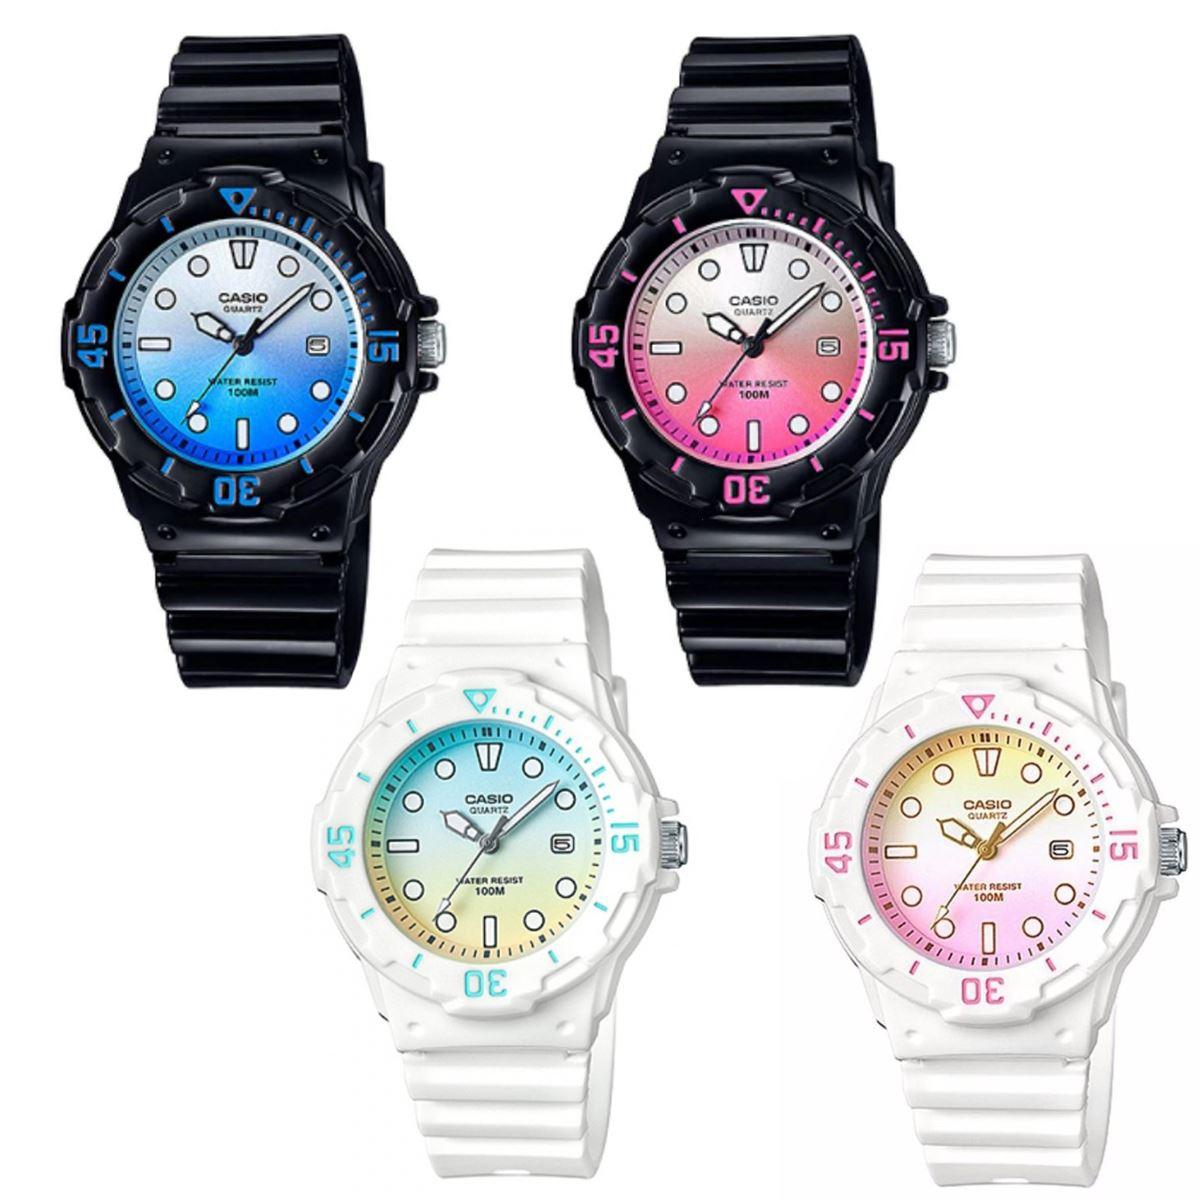 6b396c93a Casio Women's Sports Water Resistance Date Rubber Band Watch LRW ...